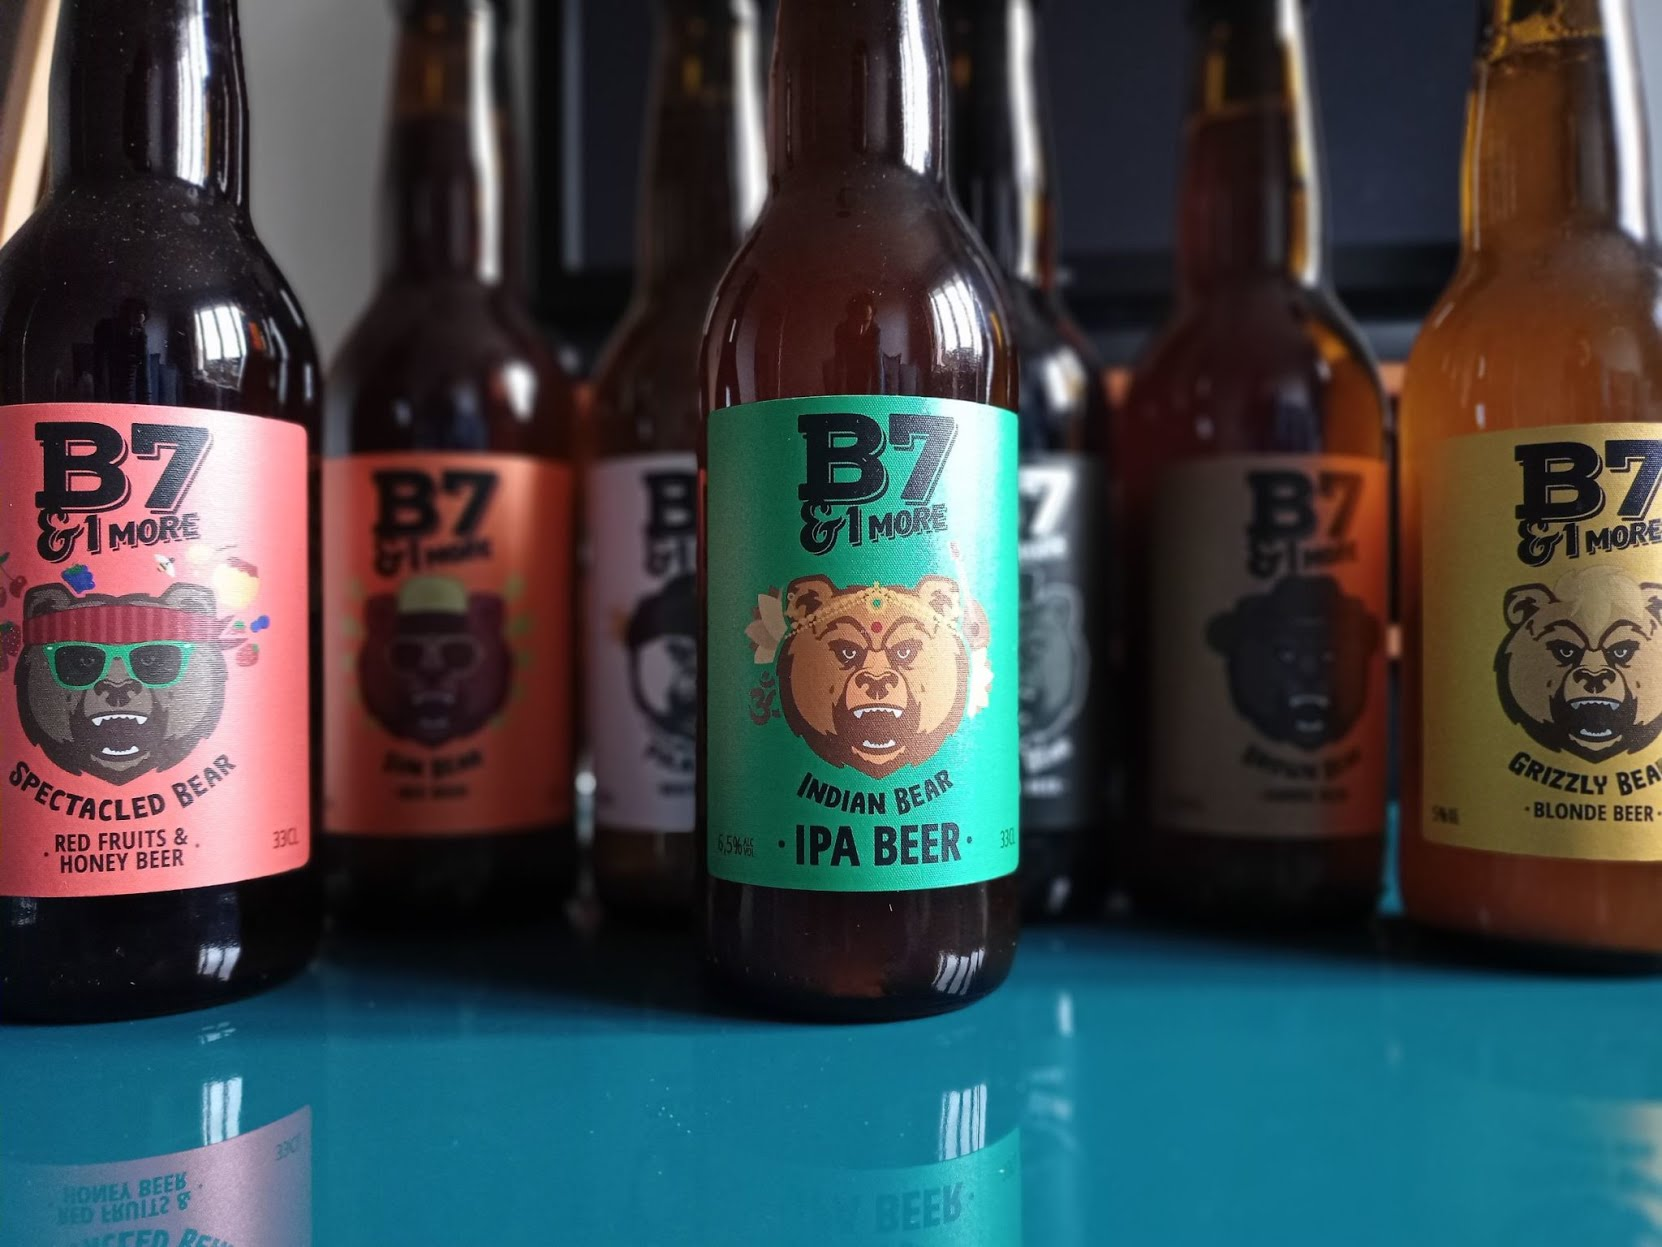 Bières B7&1 MORE